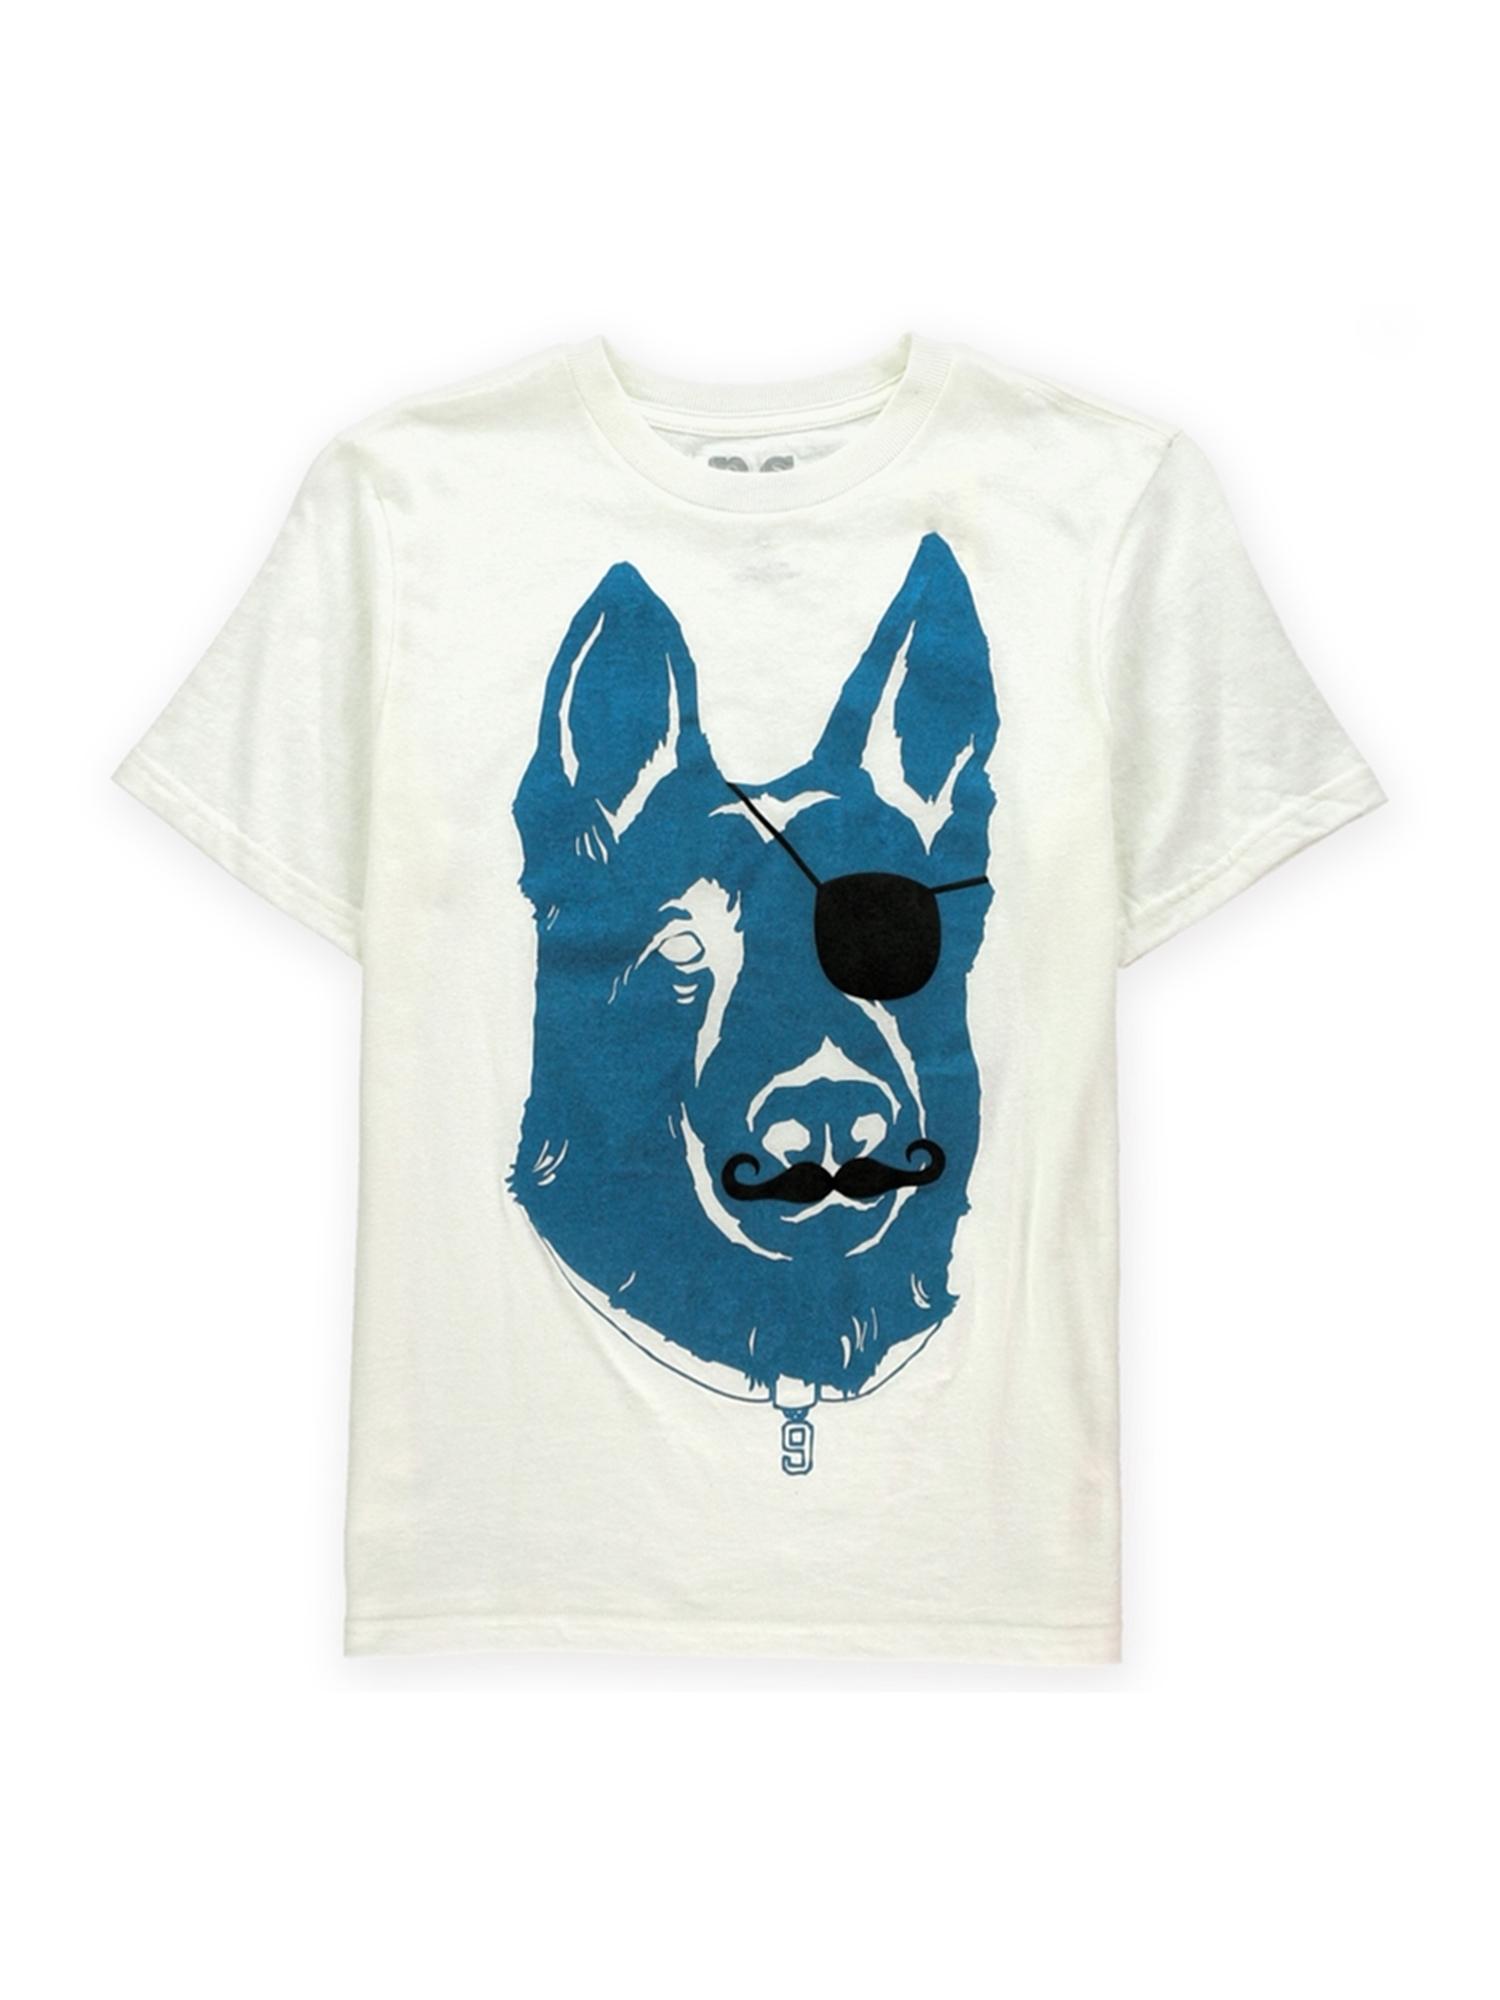 Aeropostale Boys Pirate Dog Graphic T-Shirt 102 5 - Little Kids (4-7)